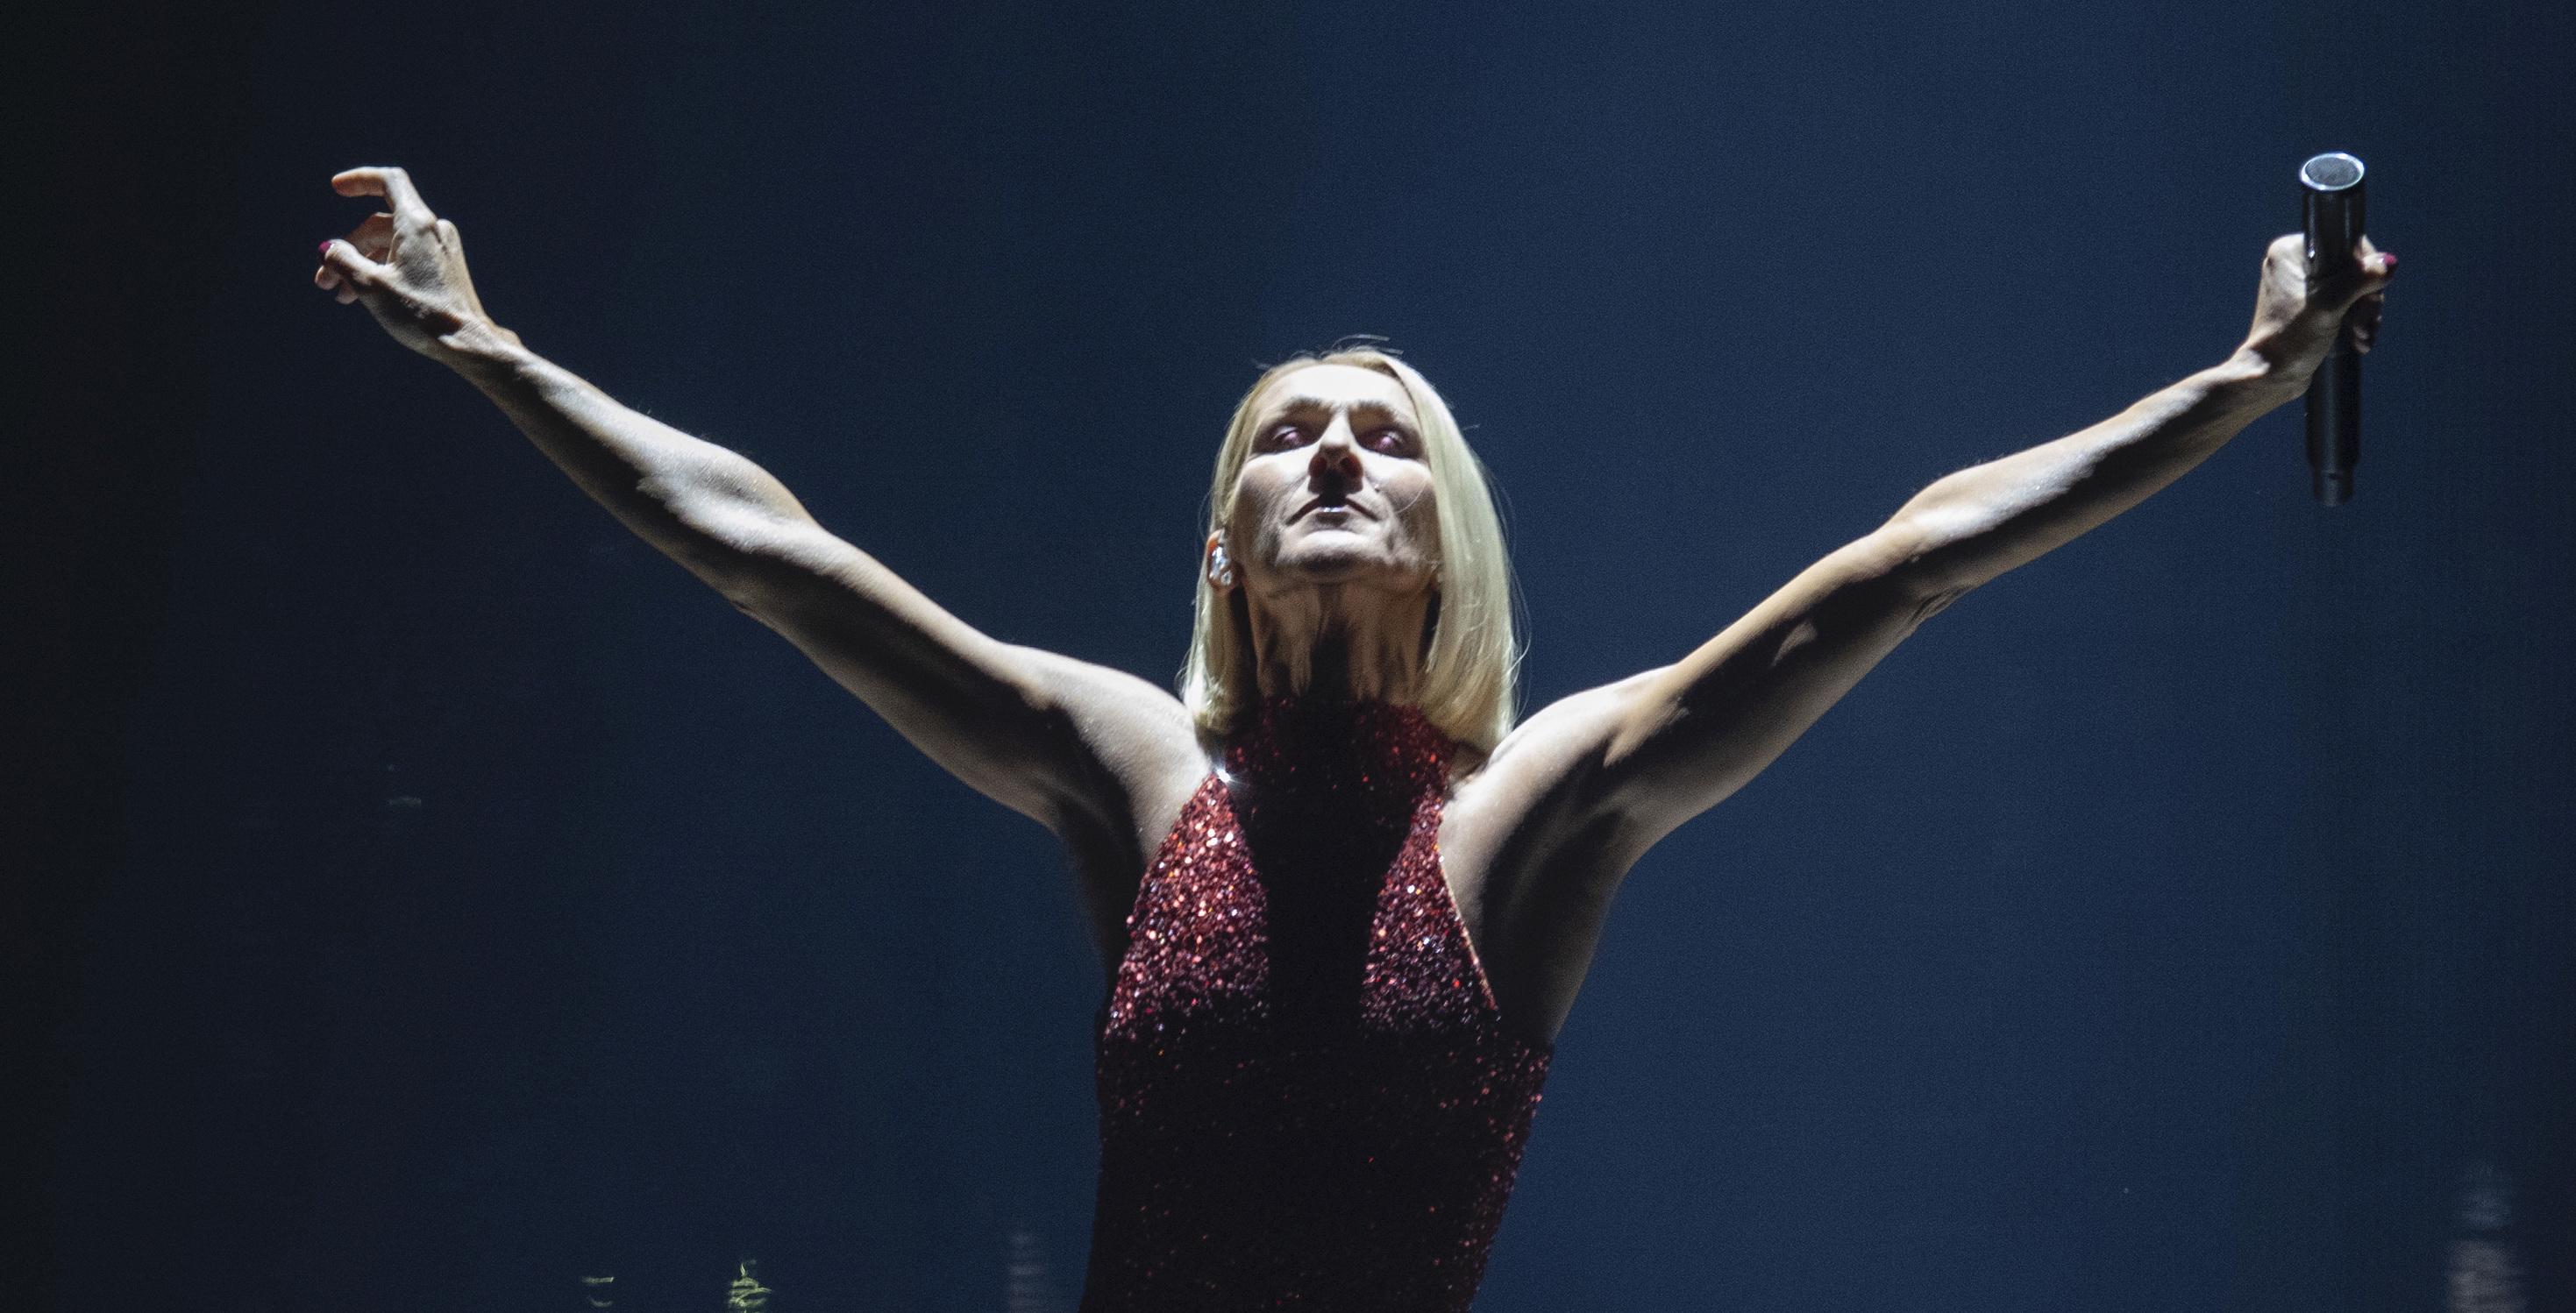 Celine Dion Postpones Las Vegas Residency, Cancels Fall/Winter Dates For Medical Reasons